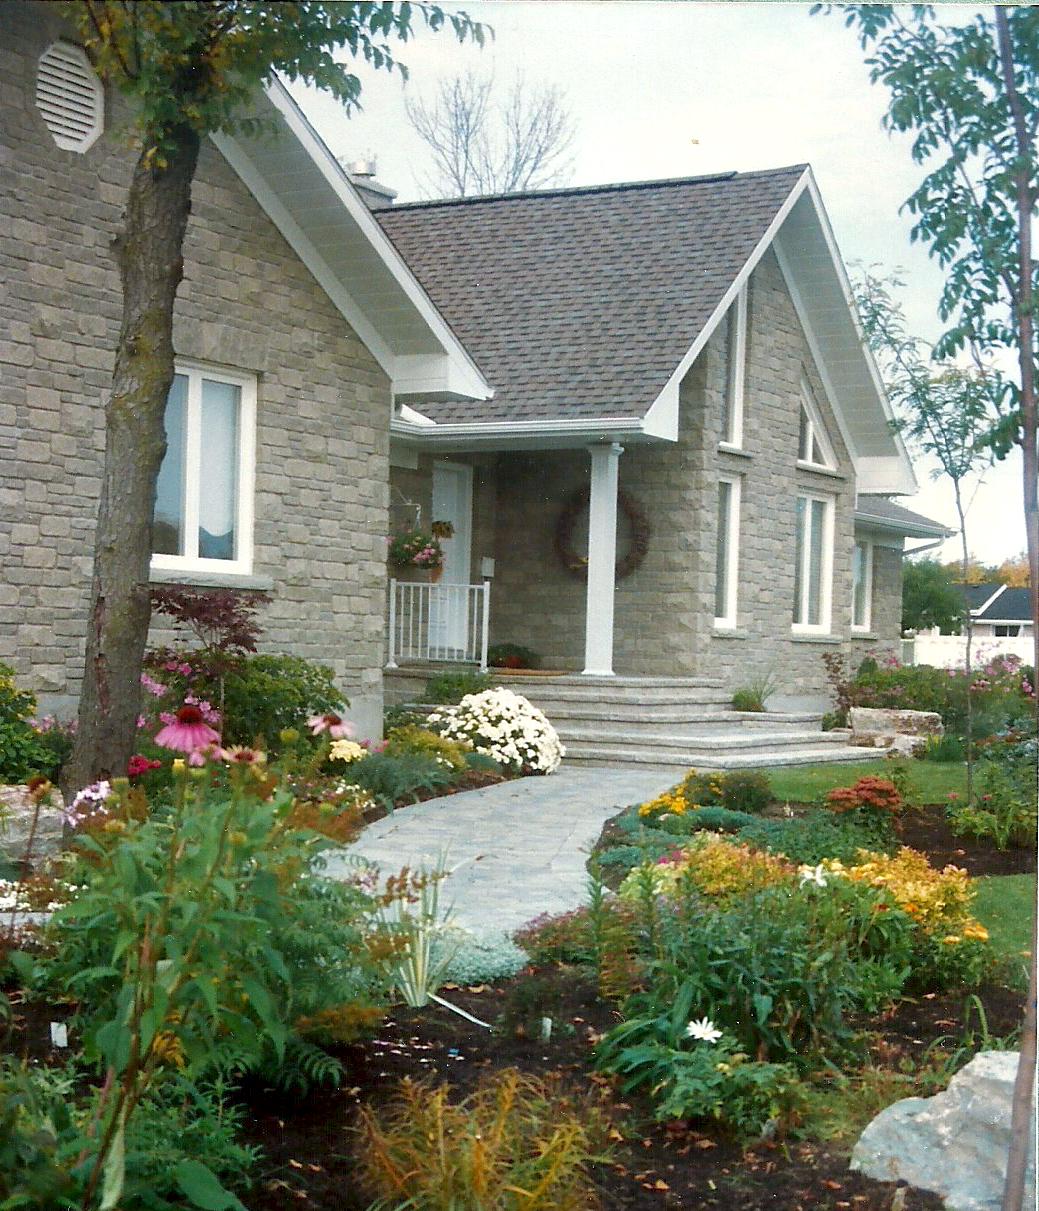 Garden | Paving Stone Entranceway | Landscaping